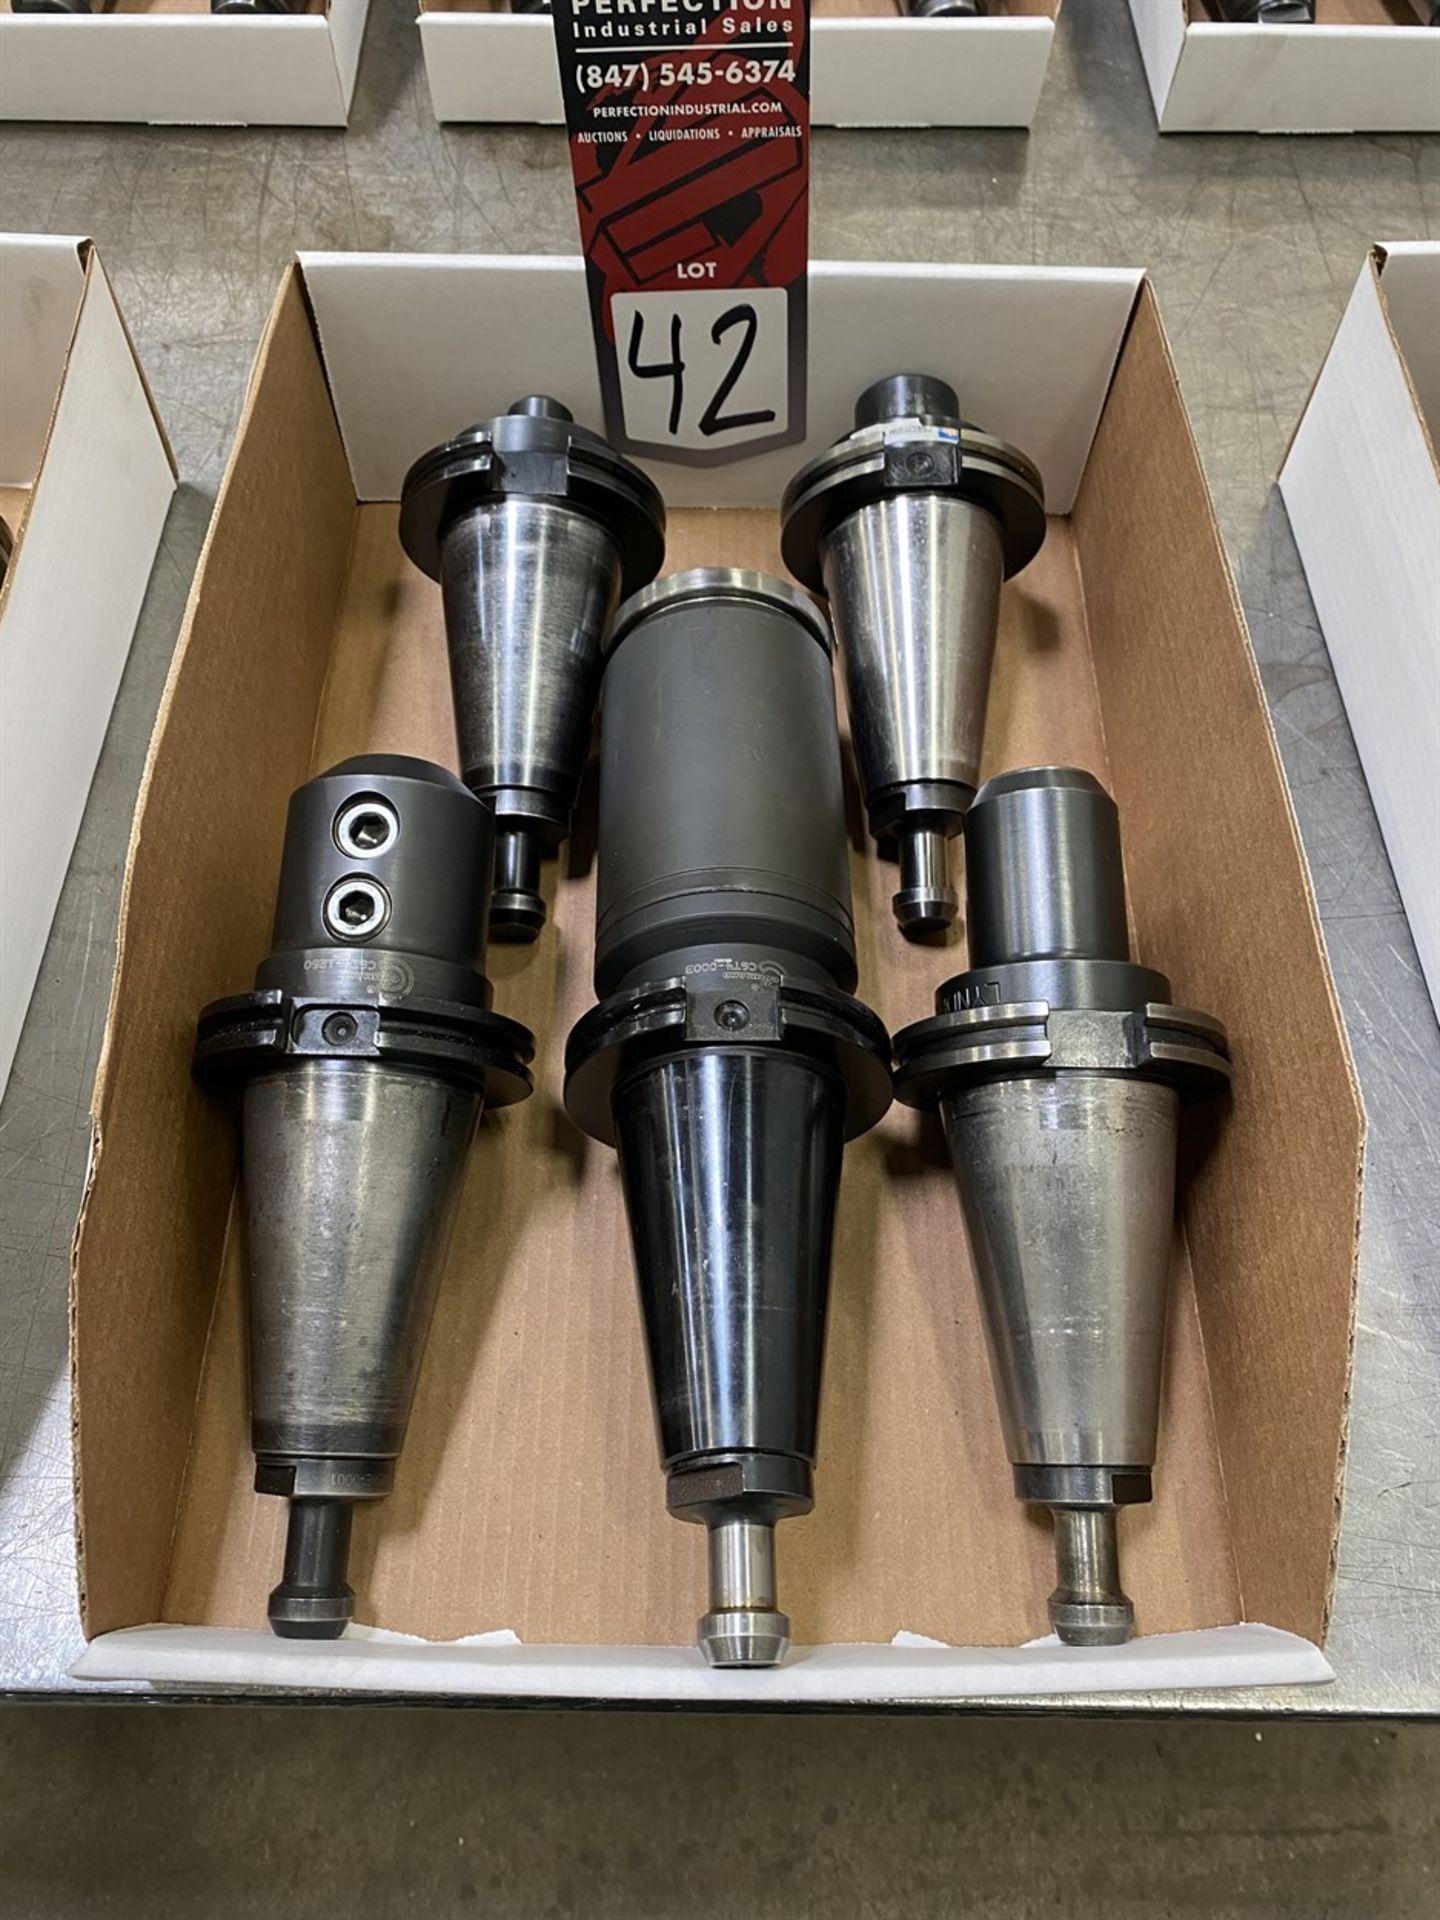 Lot 42 - Lot of (5) CAT 50 Tool Holders